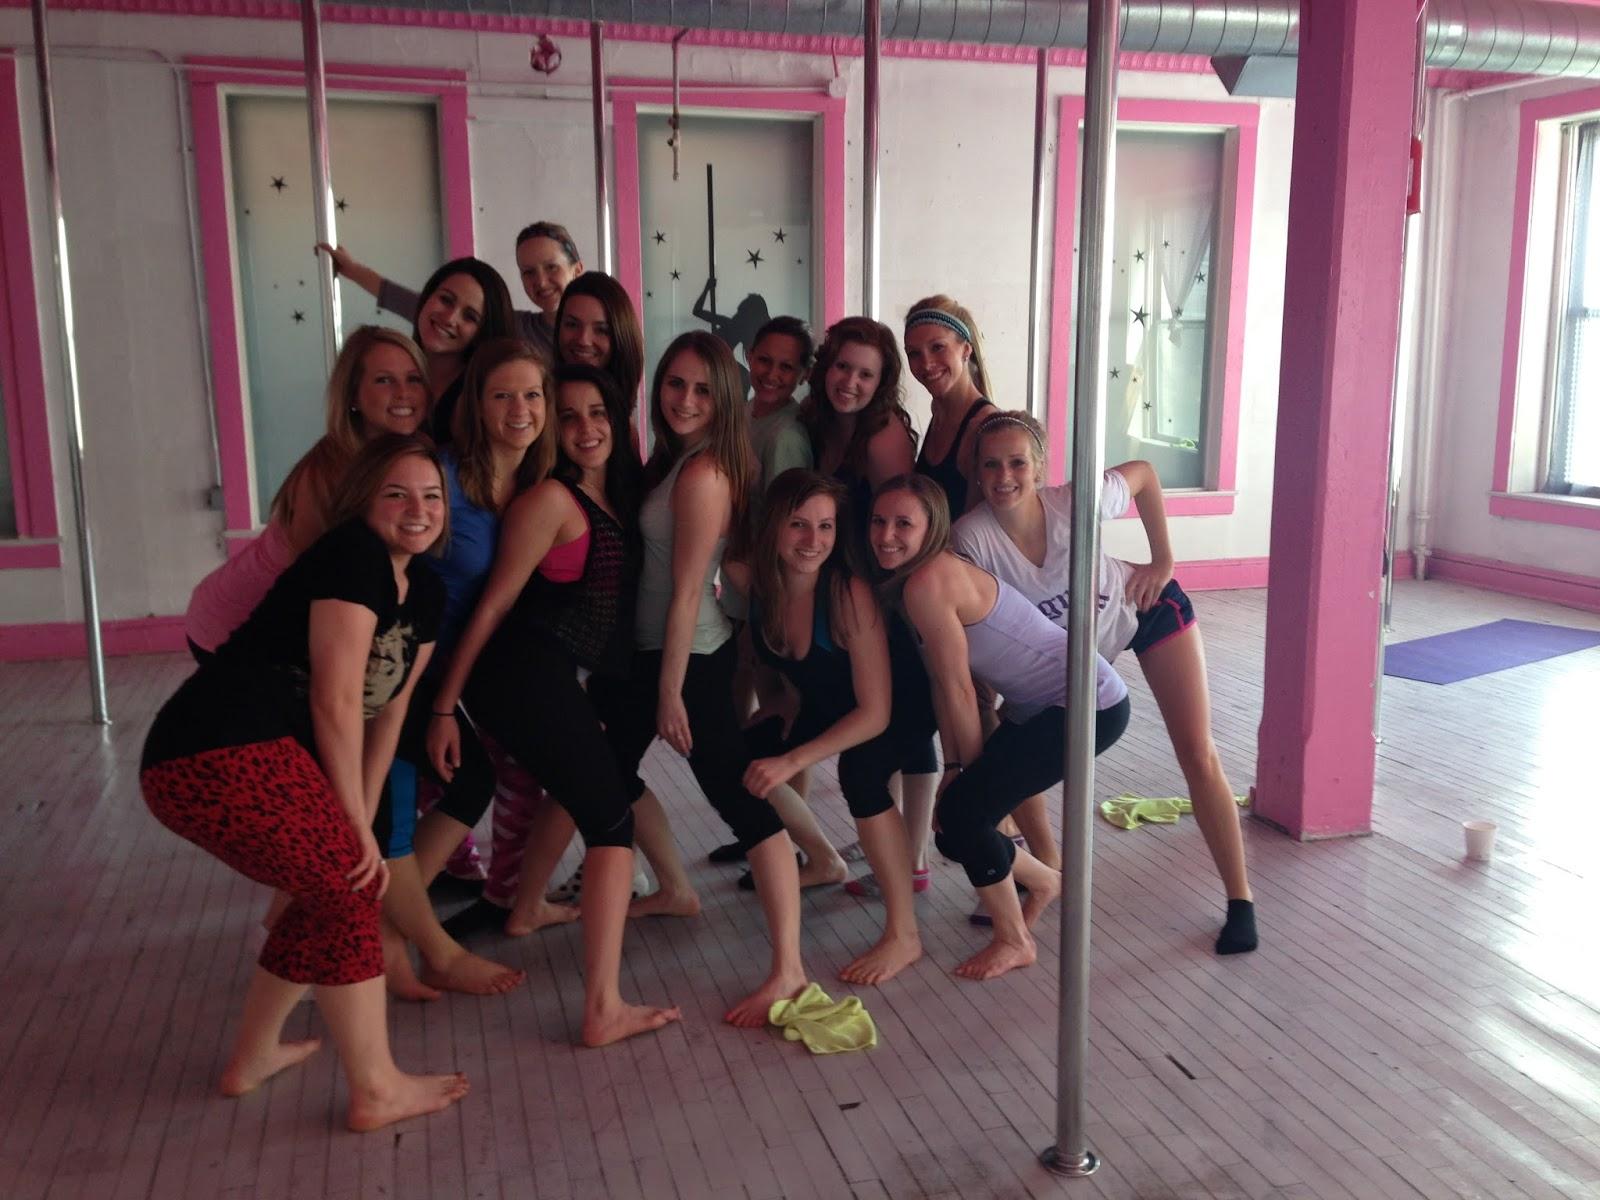 a memory of us: bachelorette party photo diary | a kansas city